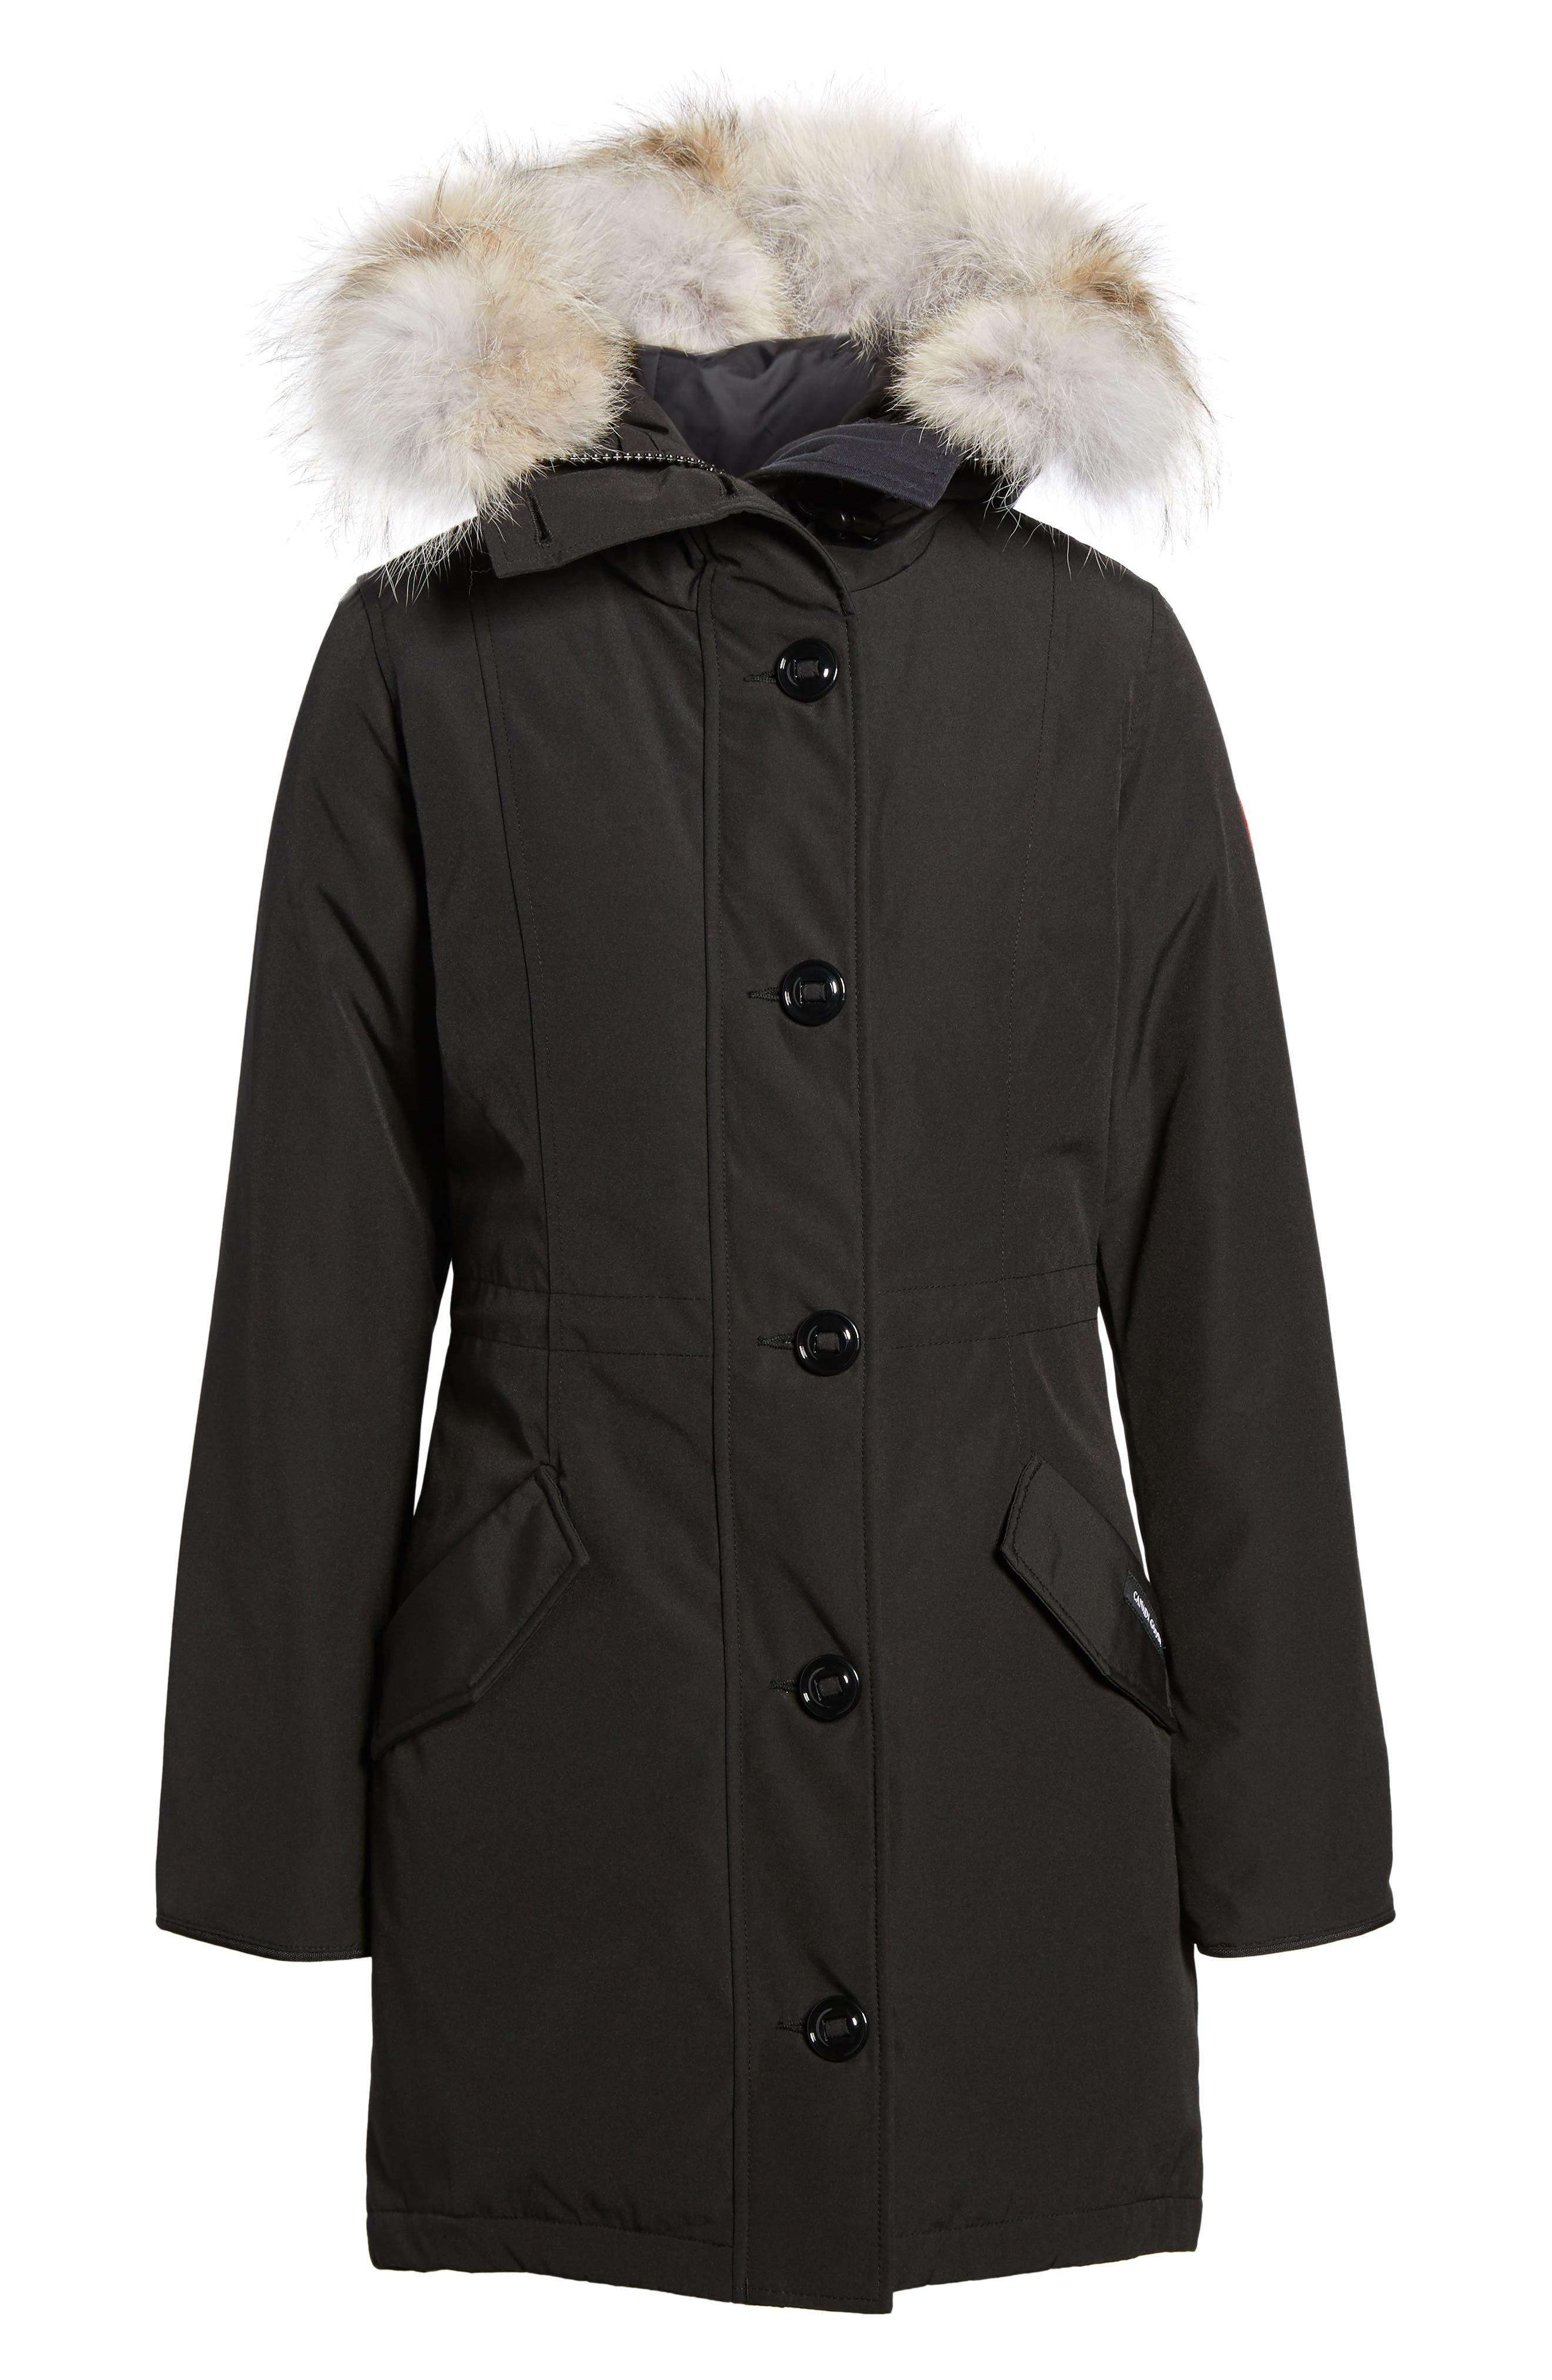 Canada Goose Rossclair Genuine Coyote Fur Trim Down Parka, (000-00) - Black